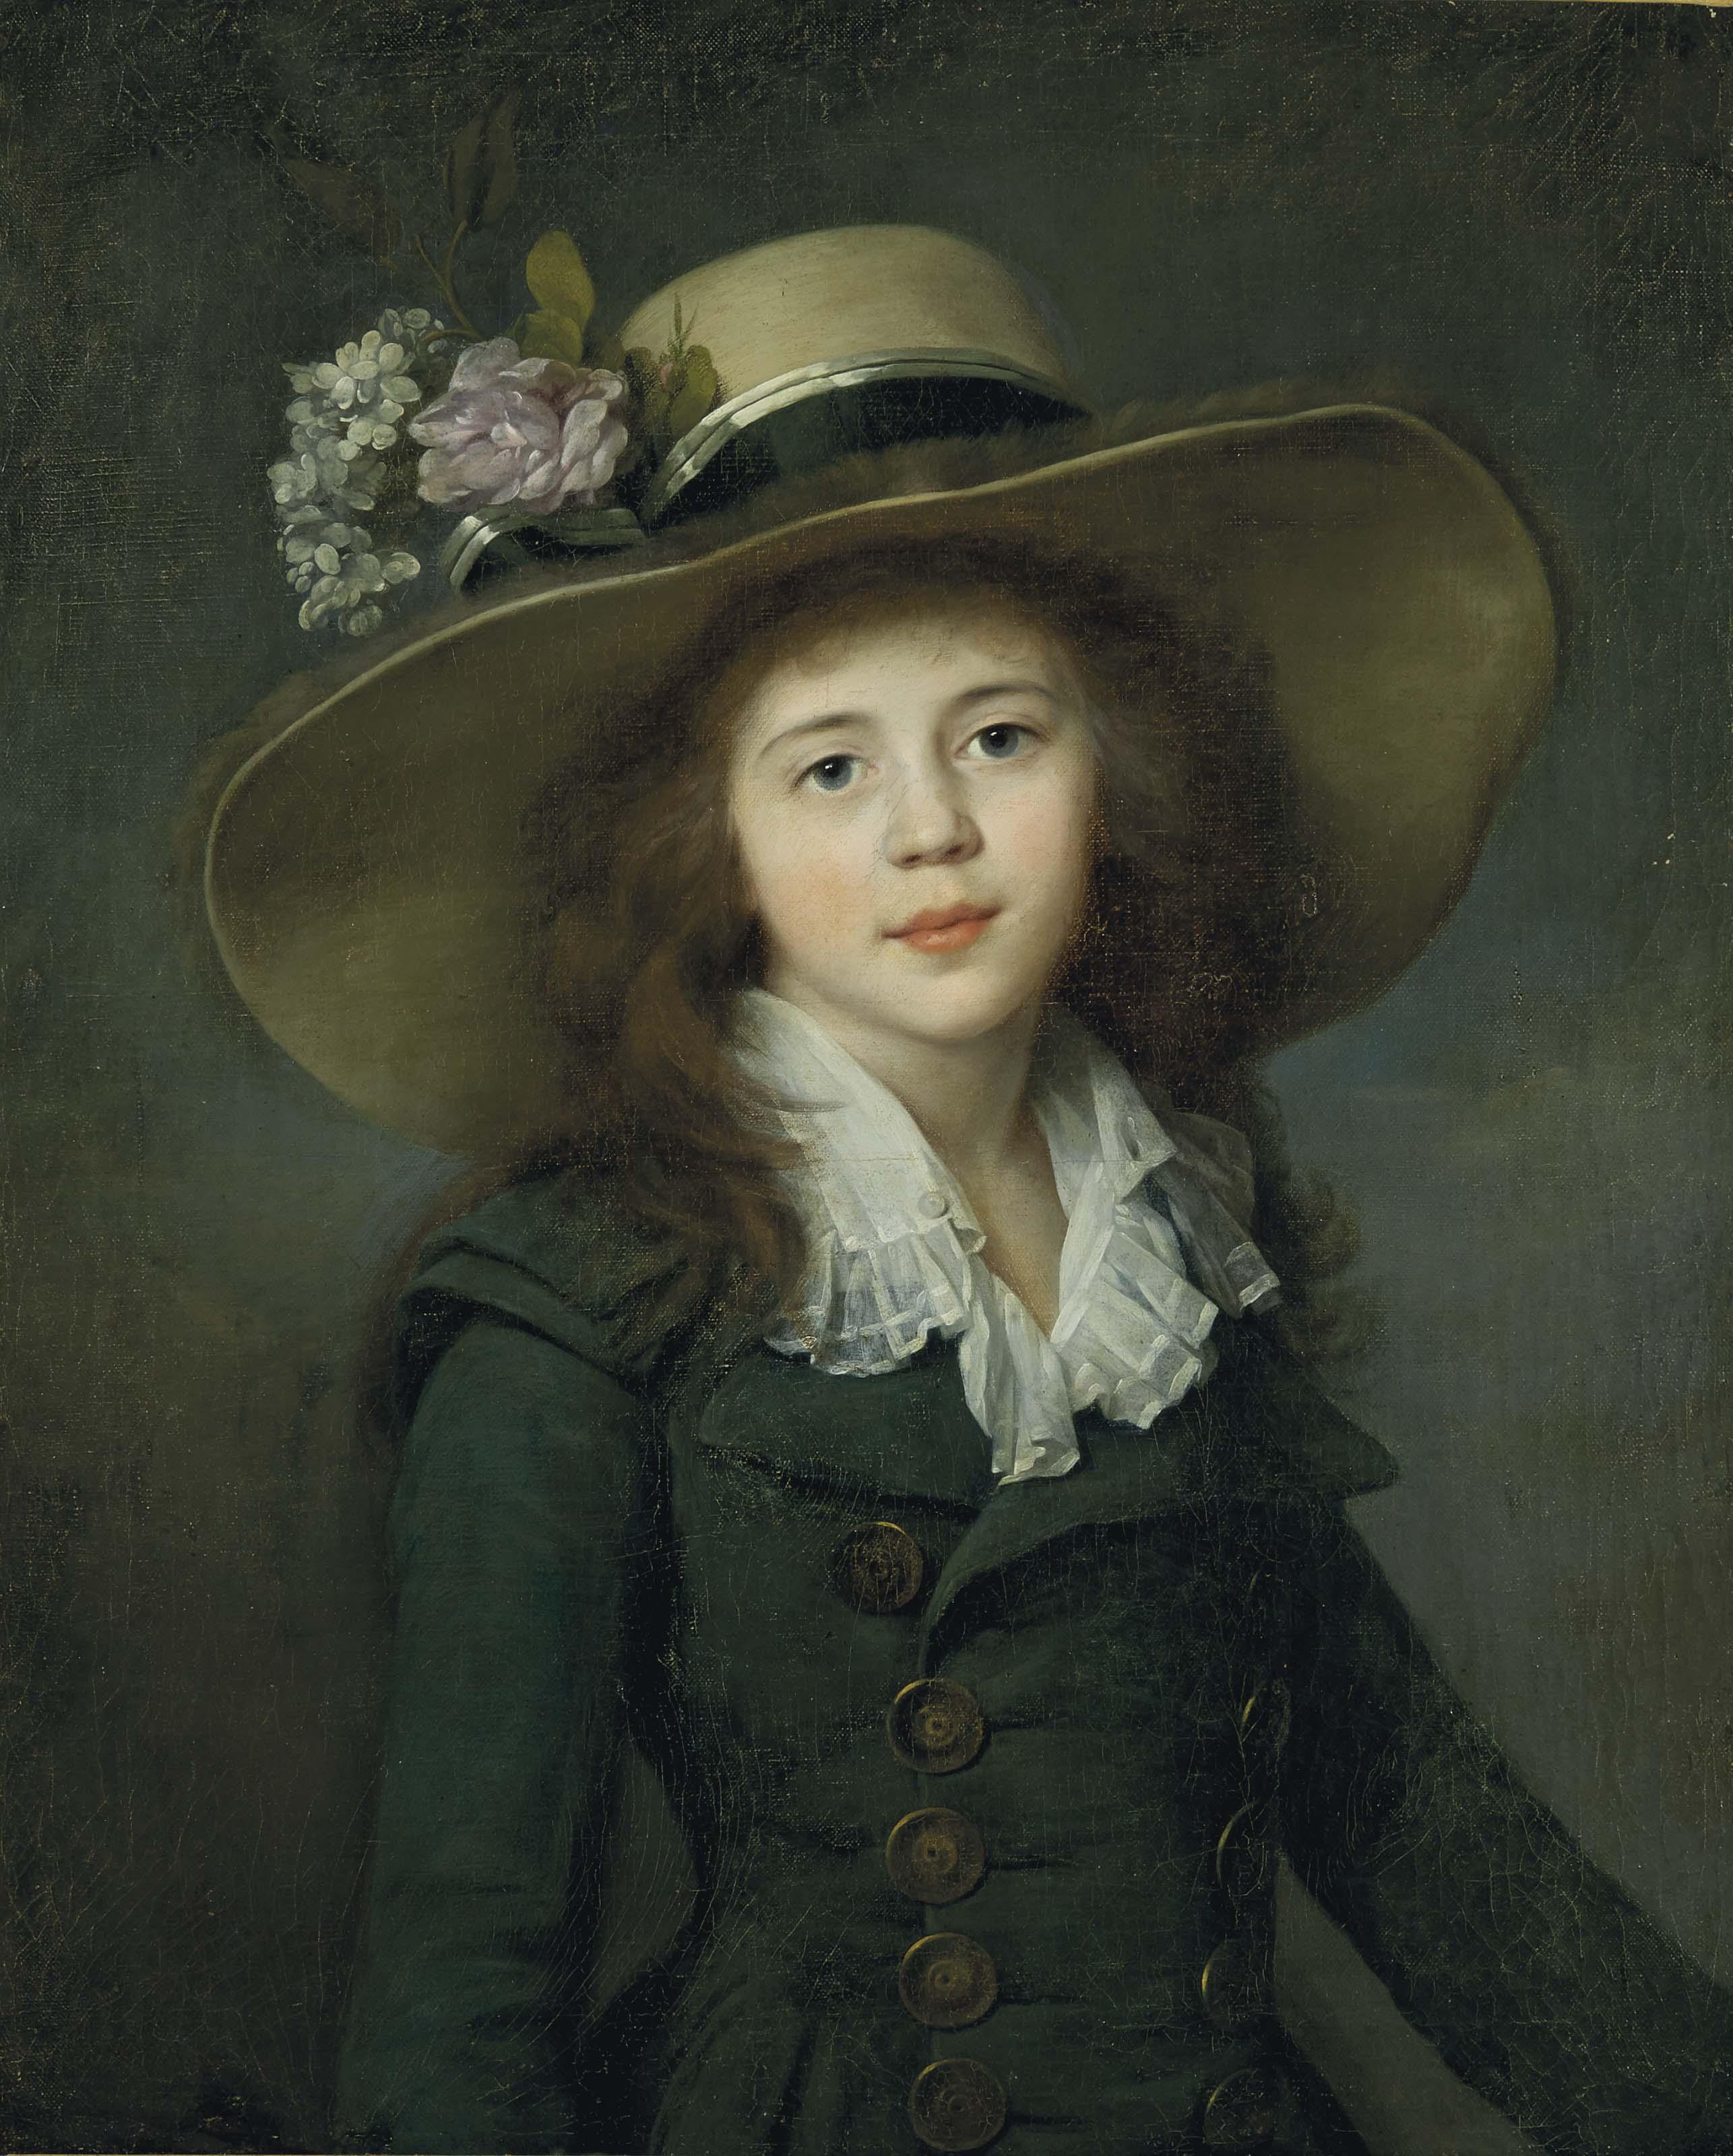 Portrait of Elizaveta Alexandrovna, Baroness Stroganova (1776-1818), later Countess Demidova, half-length